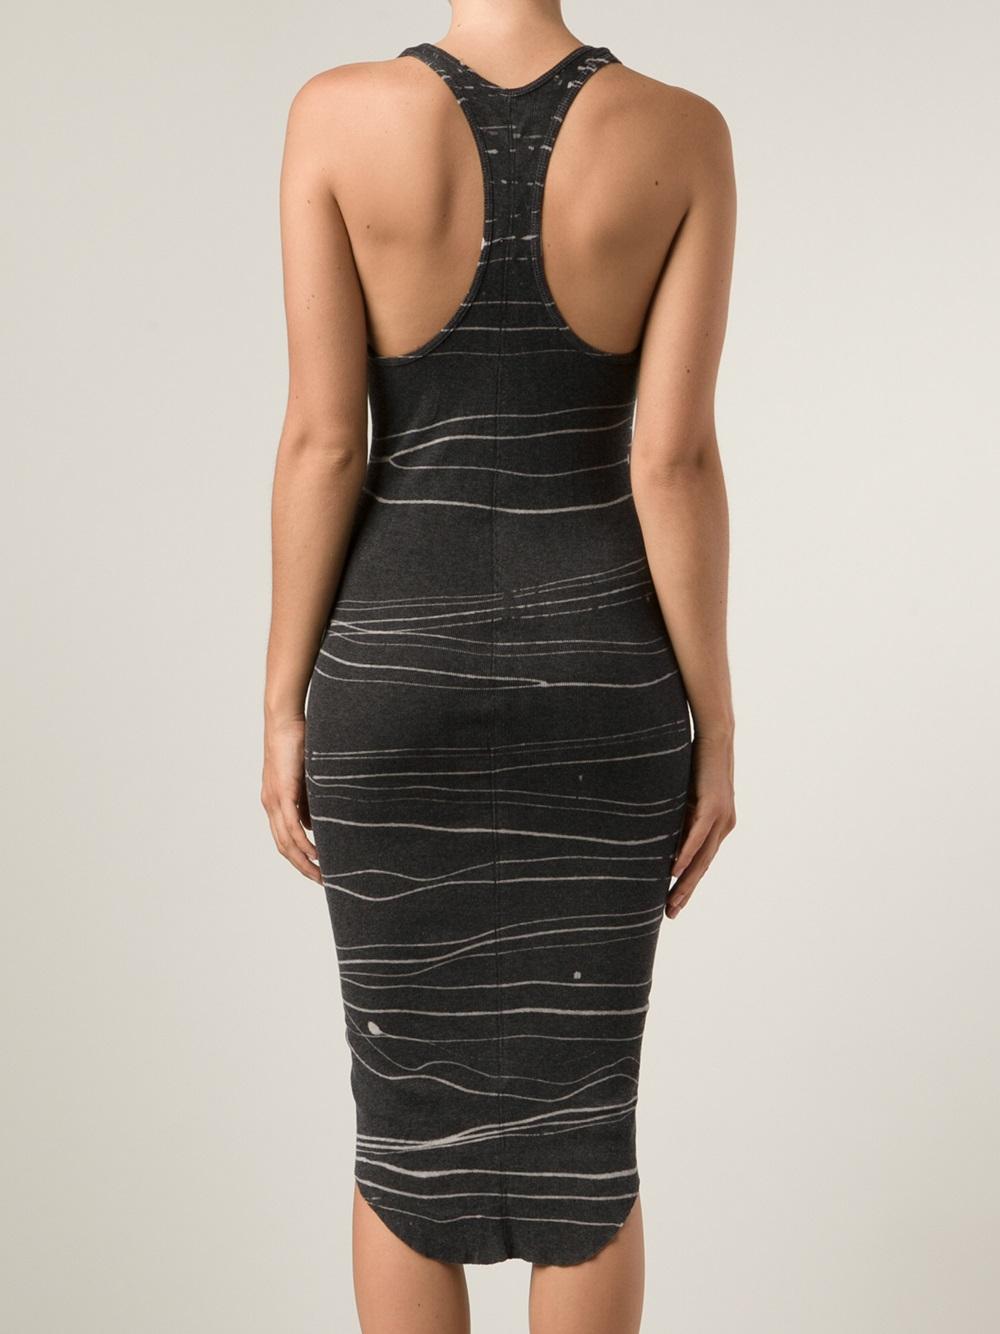 Wife beater maxi dress